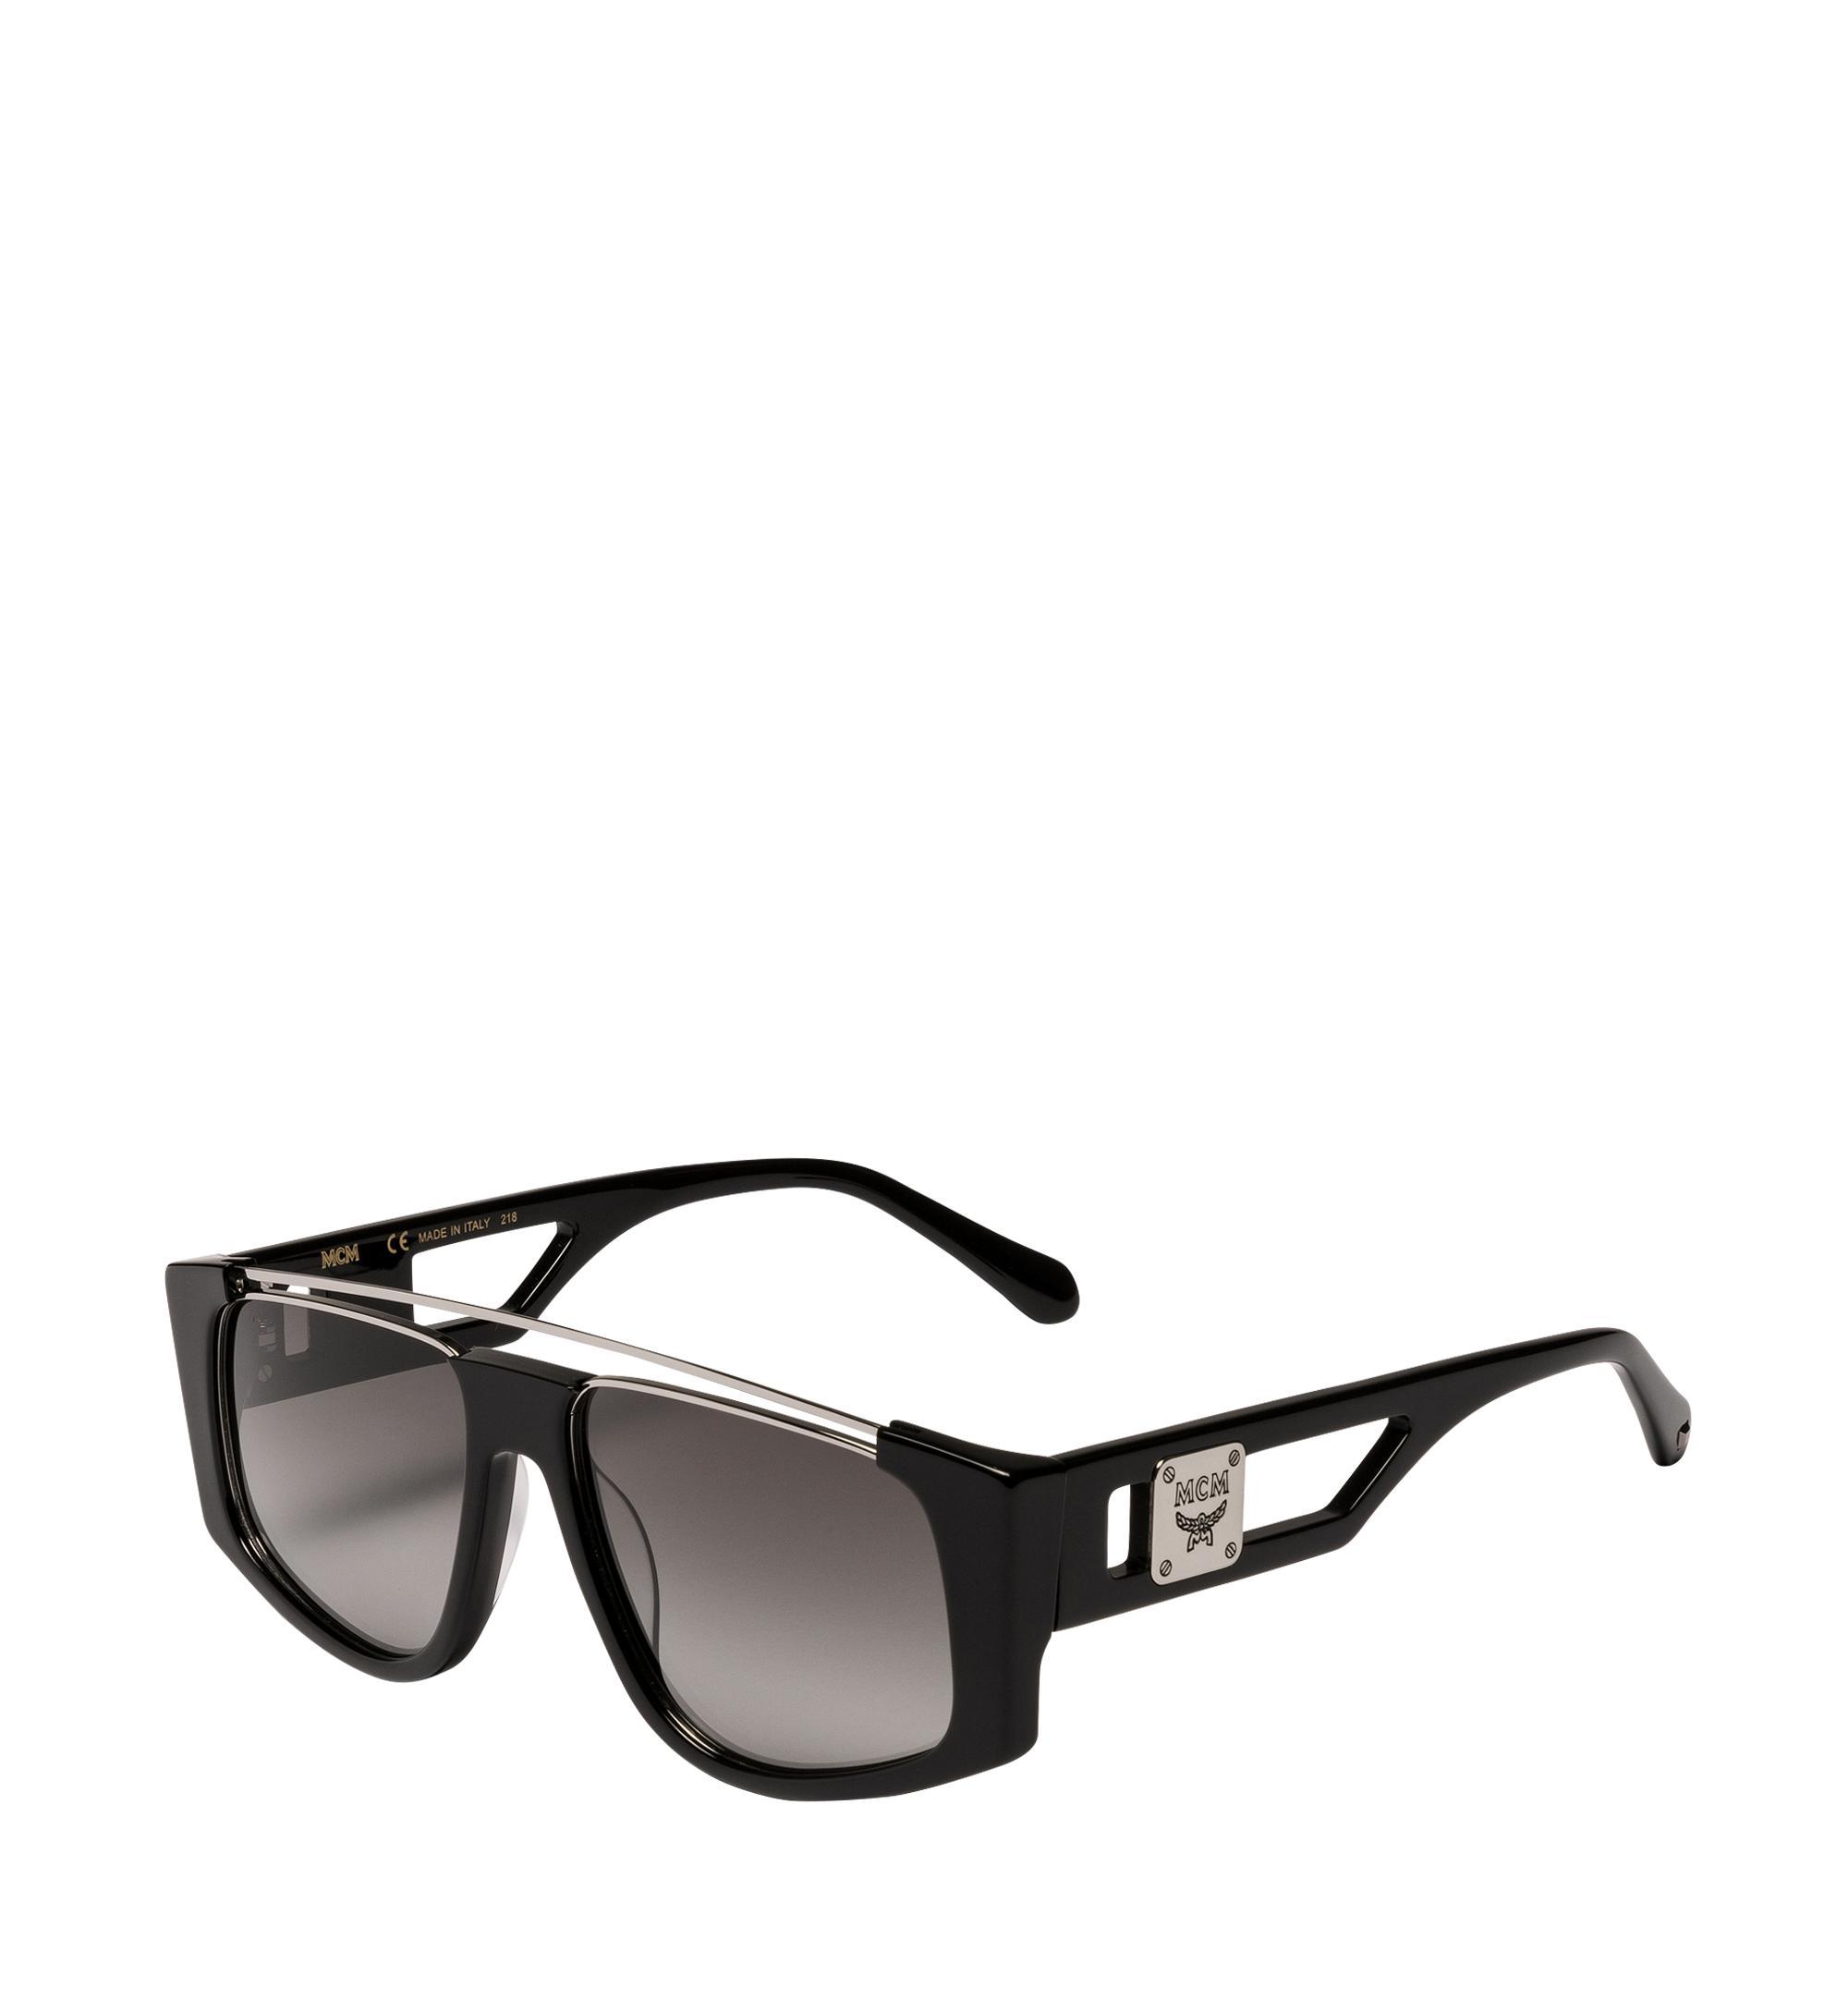 568875f83d8 MCM - Black Square Logo Plaque Sunglasses for Men - Lyst. View fullscreen